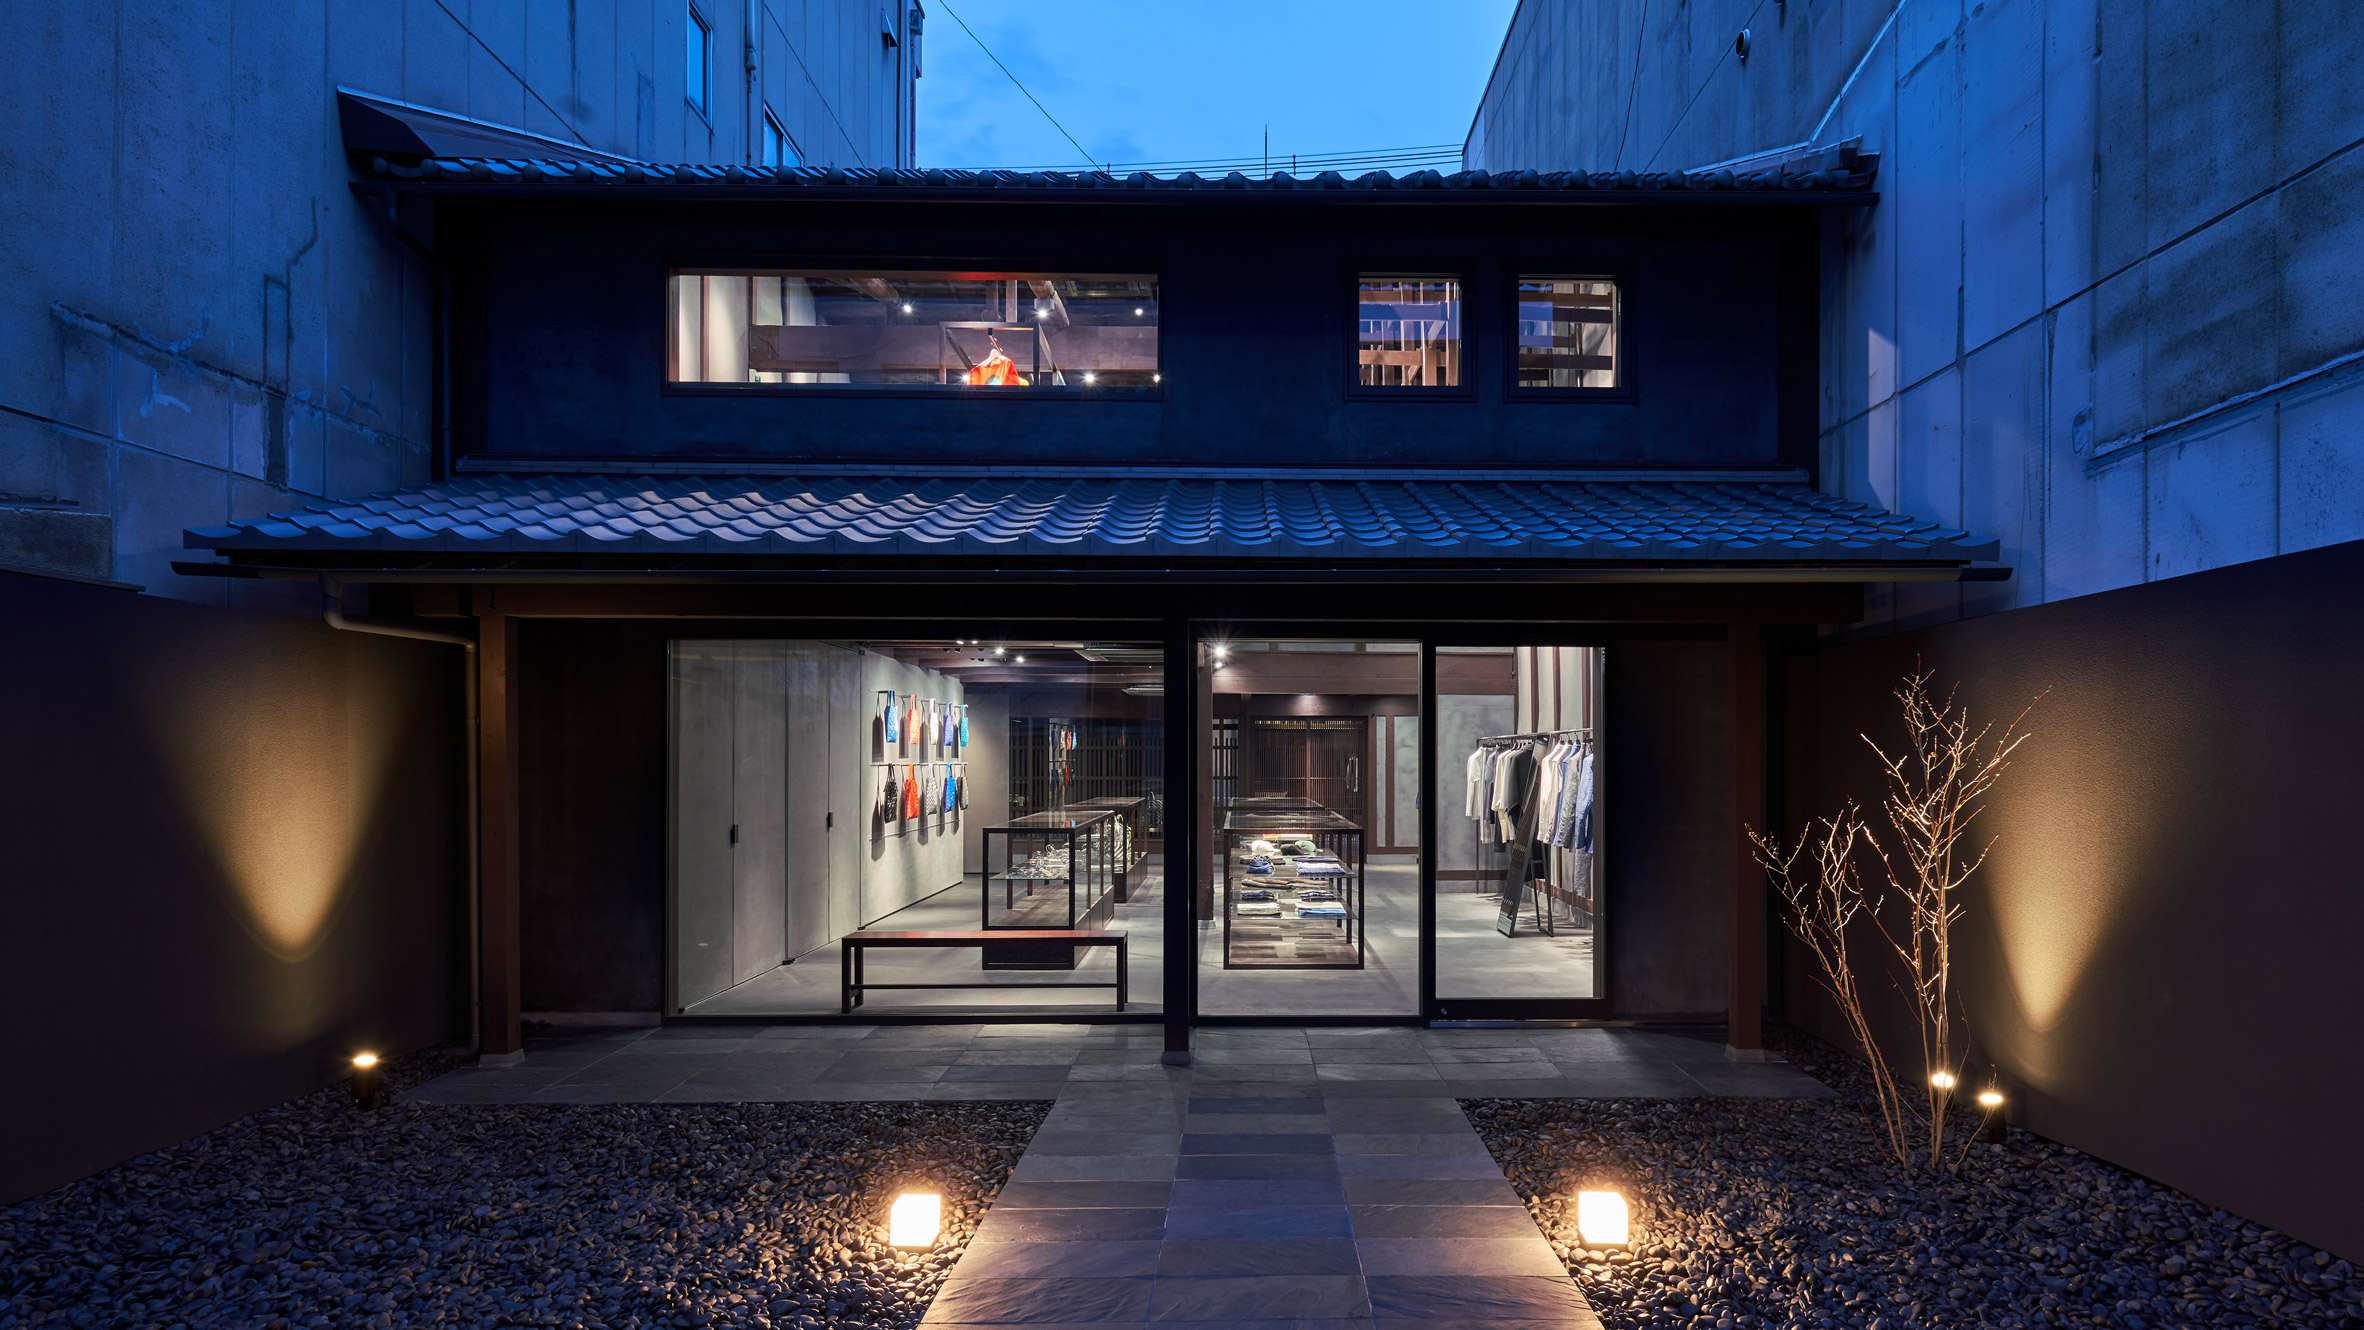 interiors-retail-shops-issey-miyake-kyoto-japan_dezainaa_2.jpg